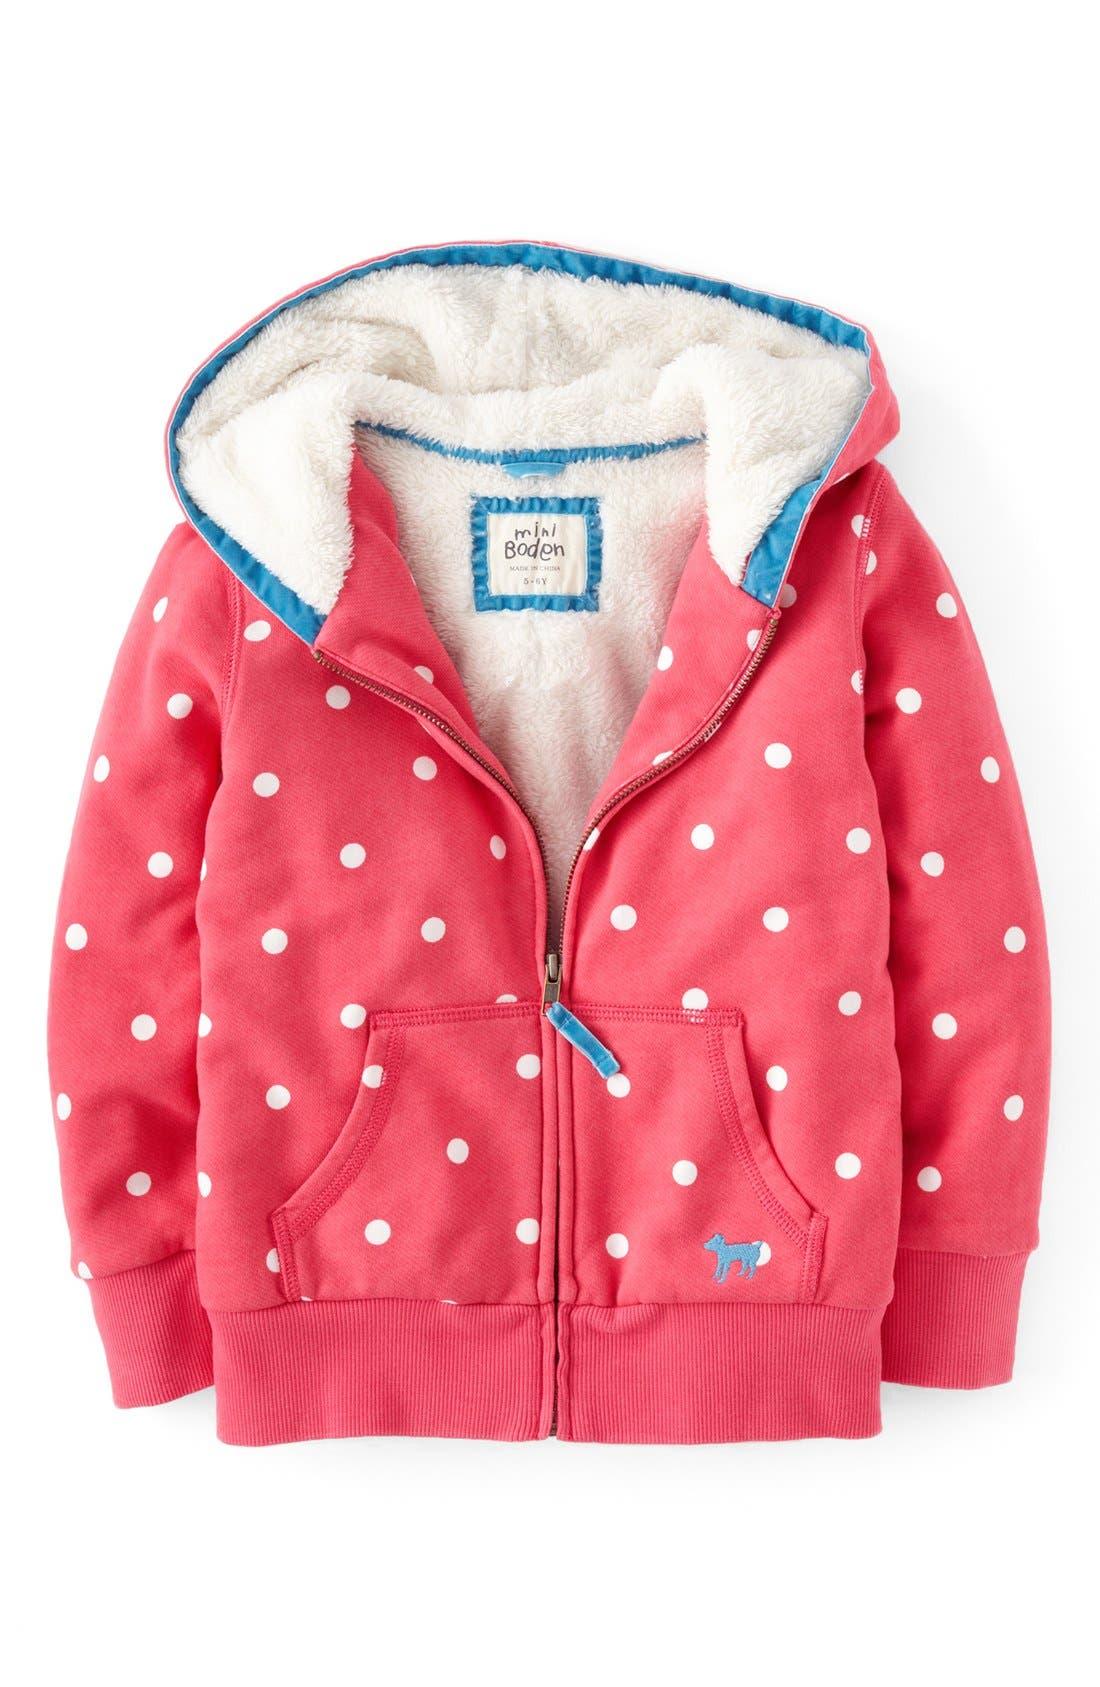 Main Image - Mini Boden 'Shaggy' Lined Jacket (Toddler Girls, Little Girls & Big Girls)